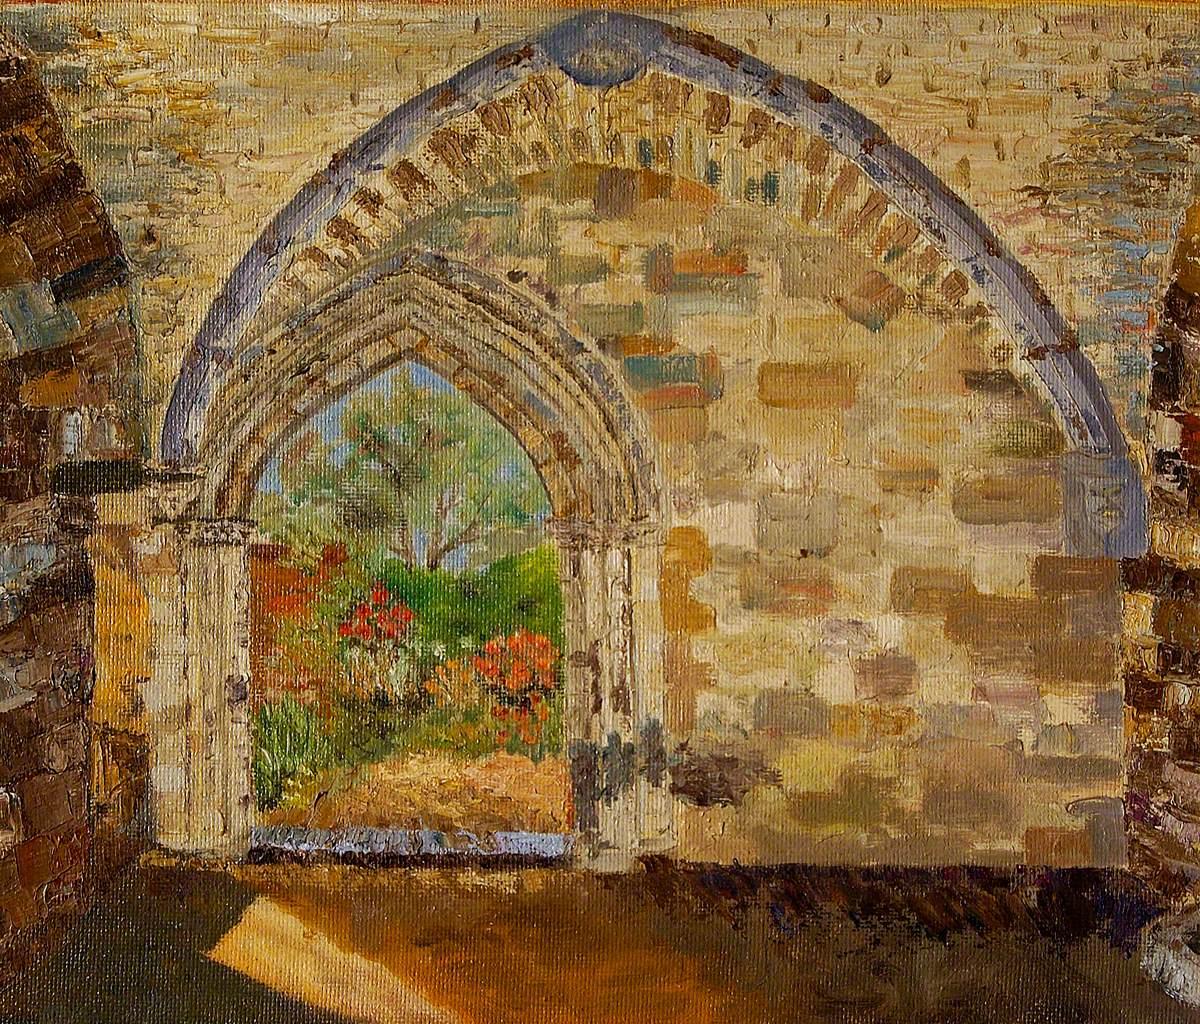 St Audry's Hospital Chapel Entrance, Woodbridge, Suffolk